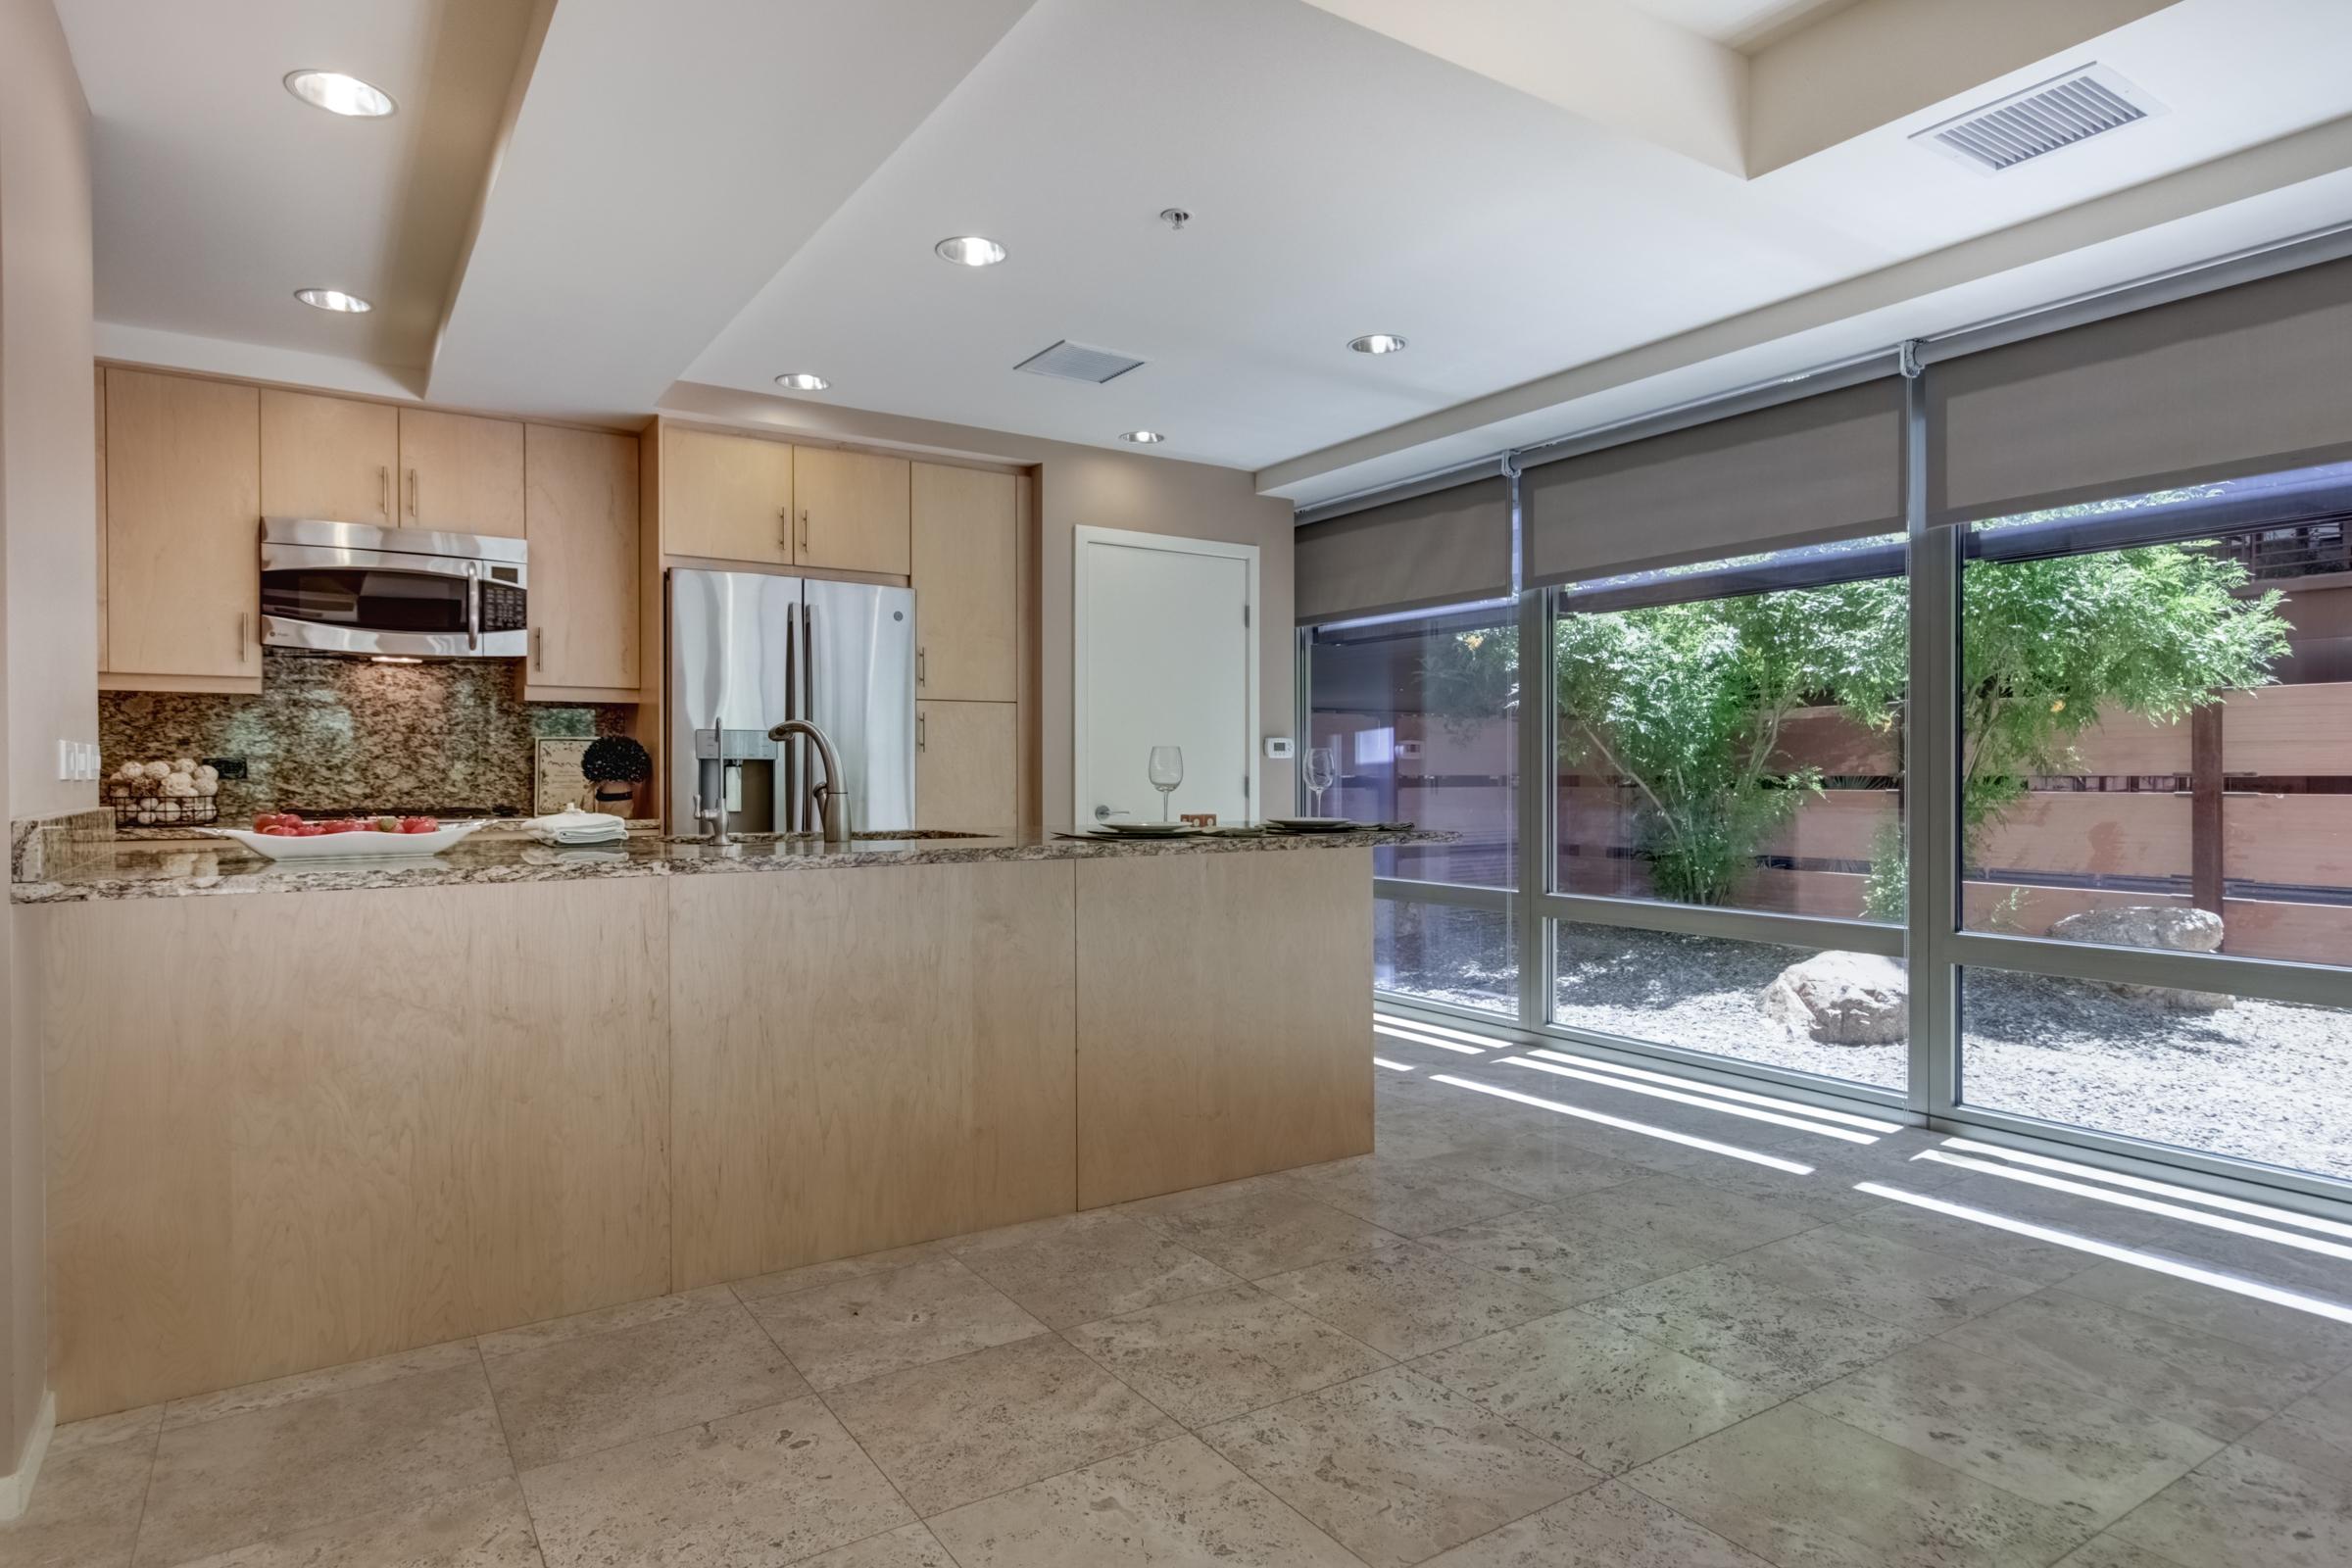 Ground Floor Condo for Rent in Optima Village